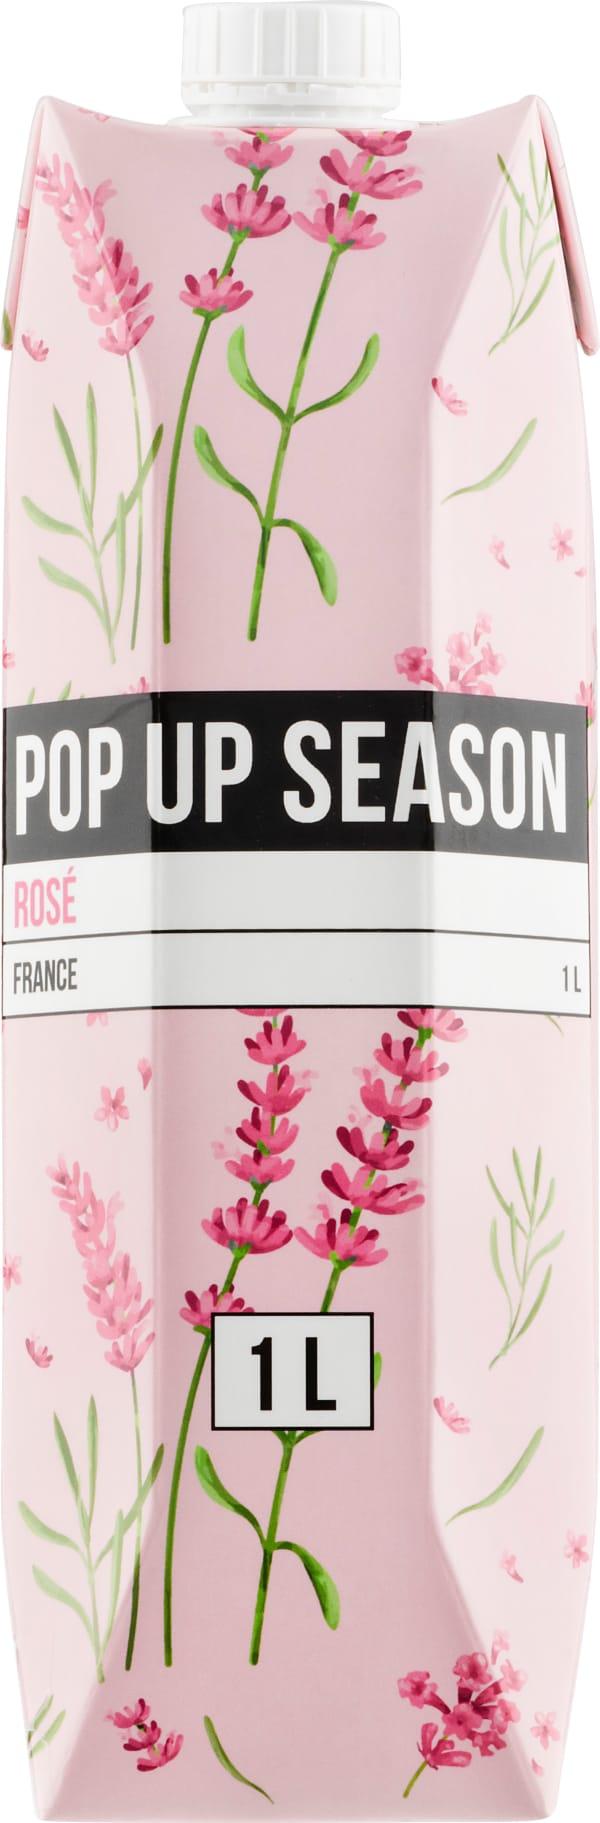 Pop Up Season Rosé 2019 carton package